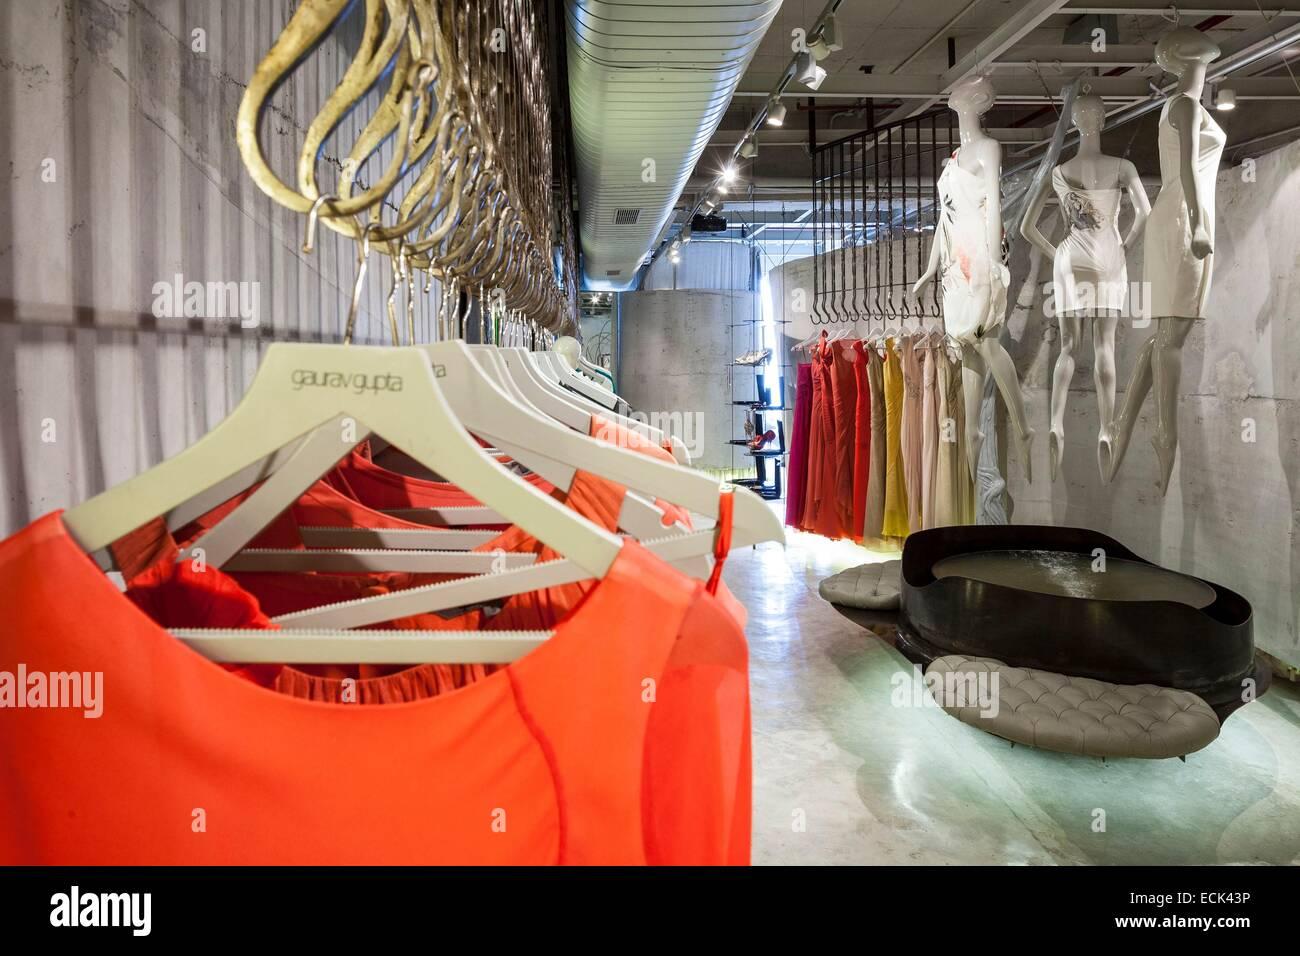 India, New Delhi, Vasant Kunj, luxury mall DLF Emporio, store designer Gaurav Gupta fashion designed by the architectural - Stock Image